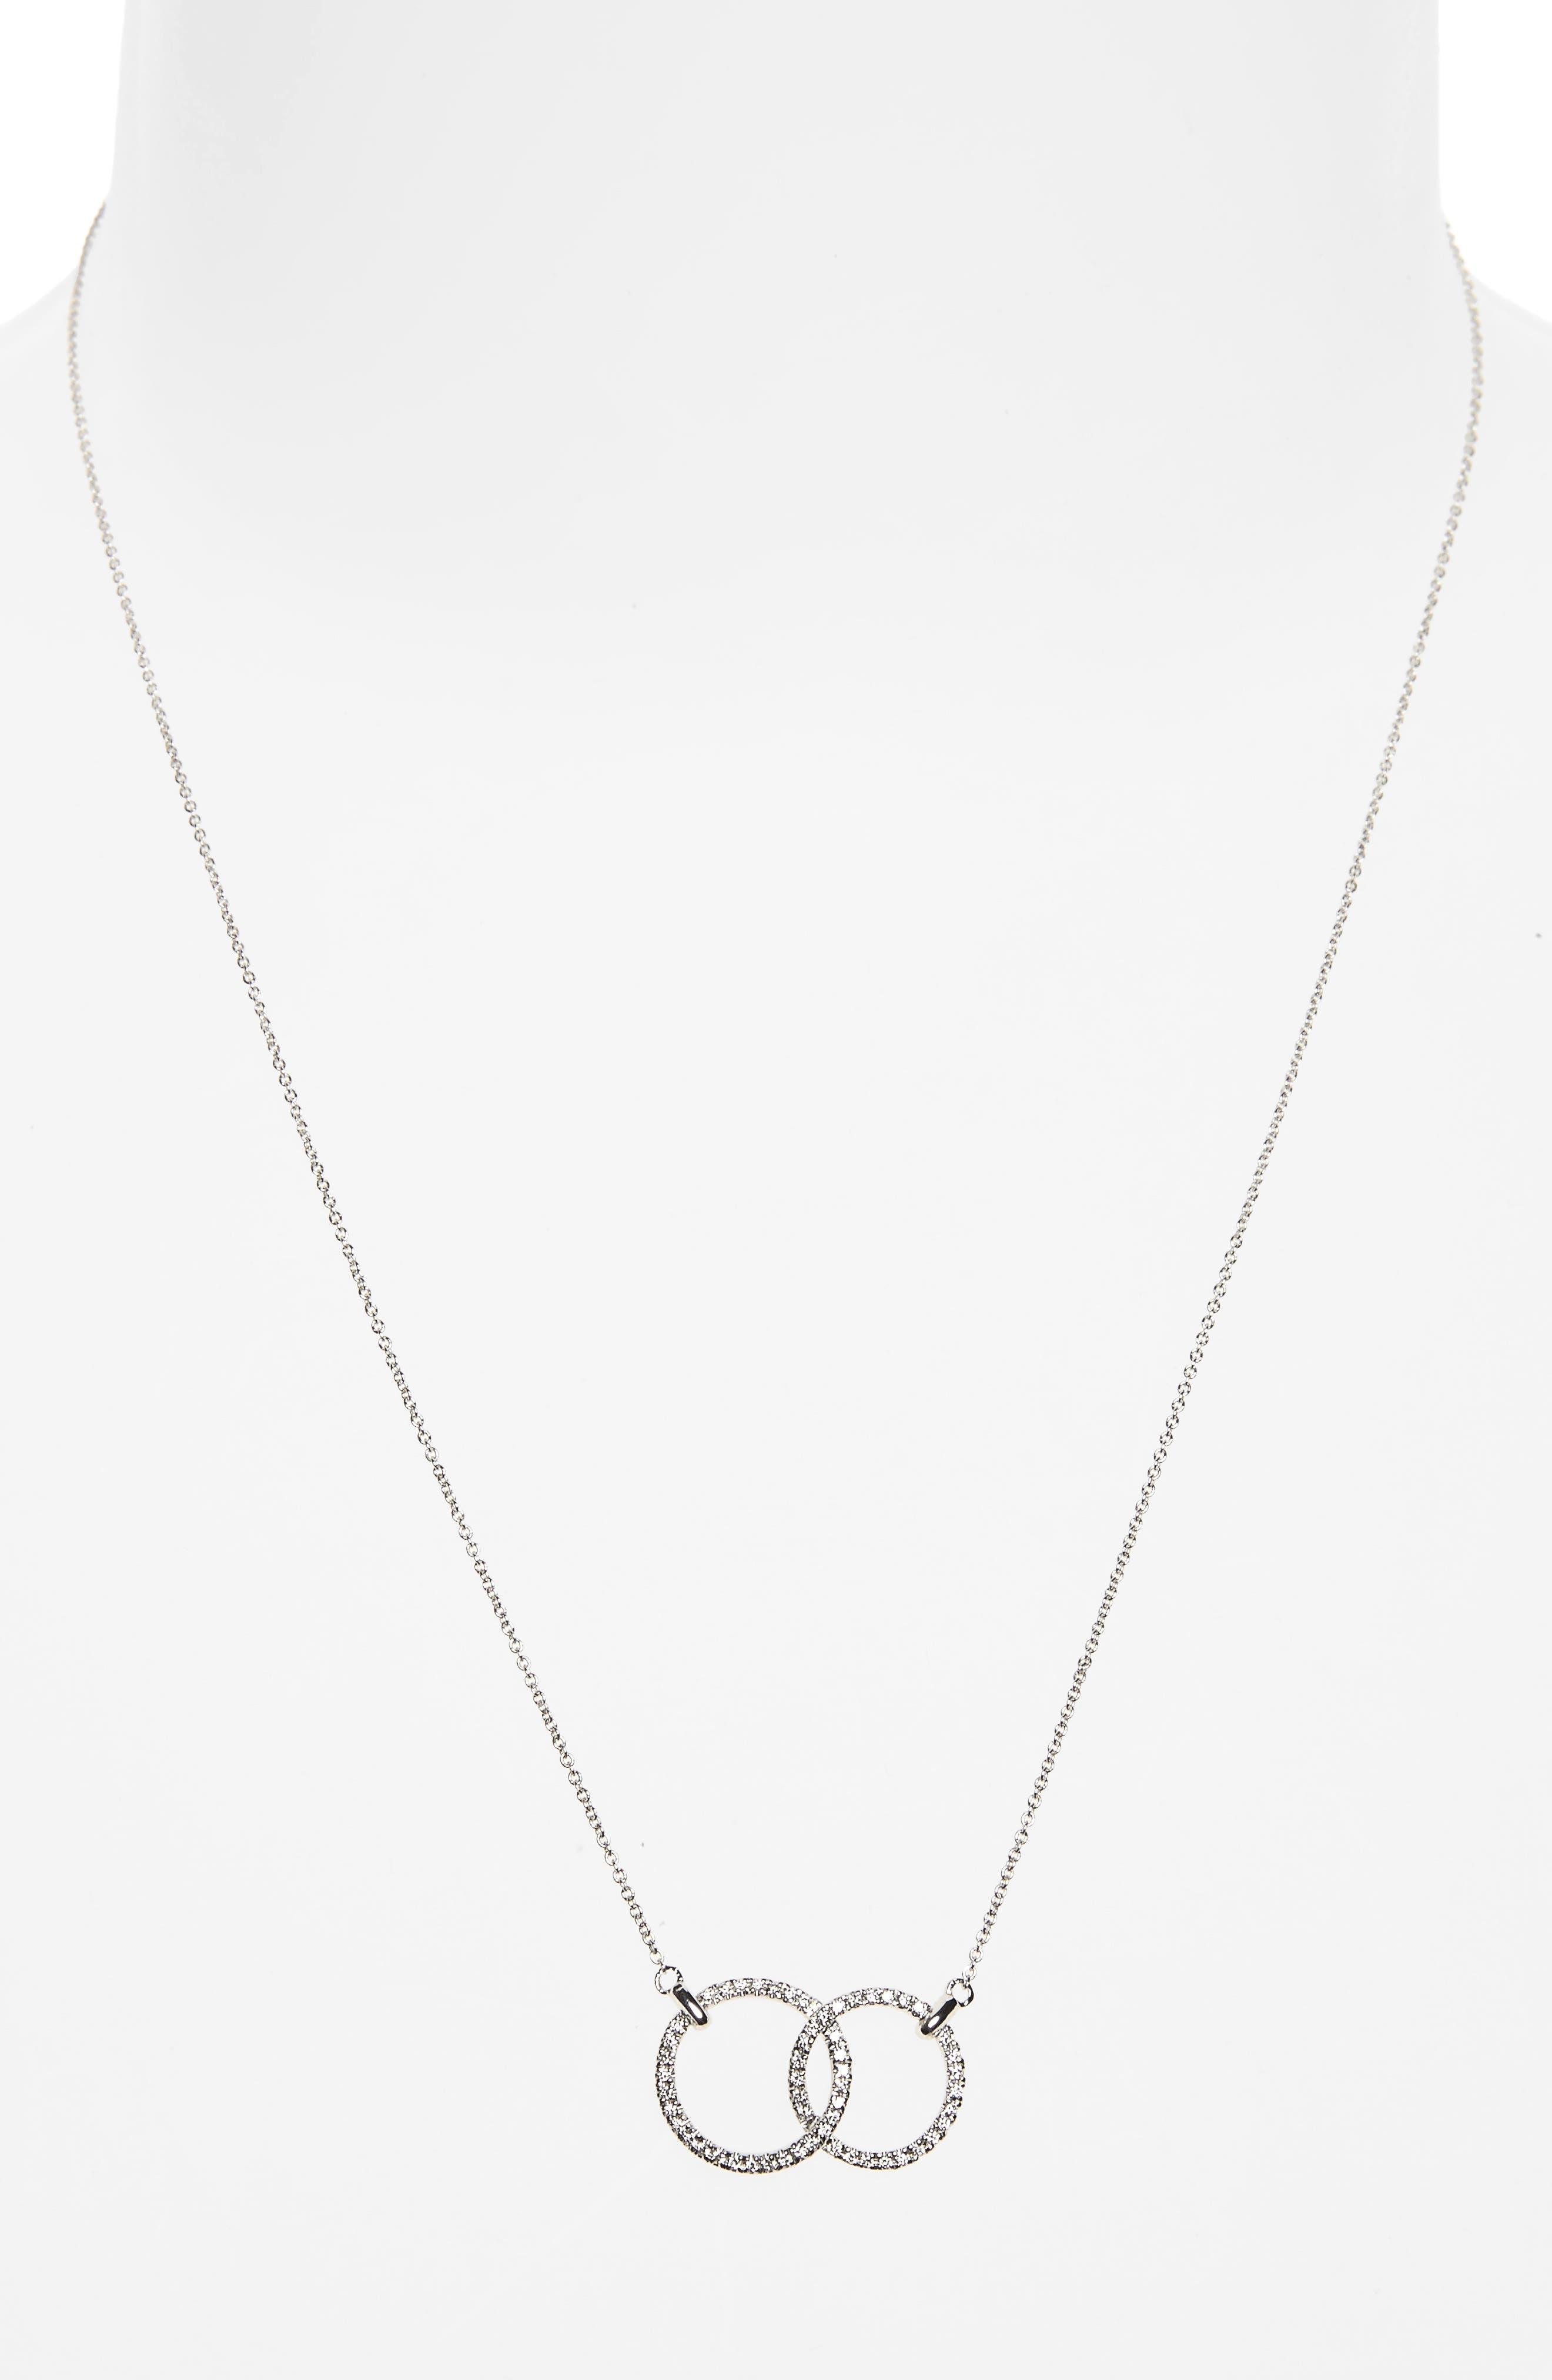 Double Diamond Circle Pendant Necklace,                             Alternate thumbnail 3, color,                             WHITE GOLD